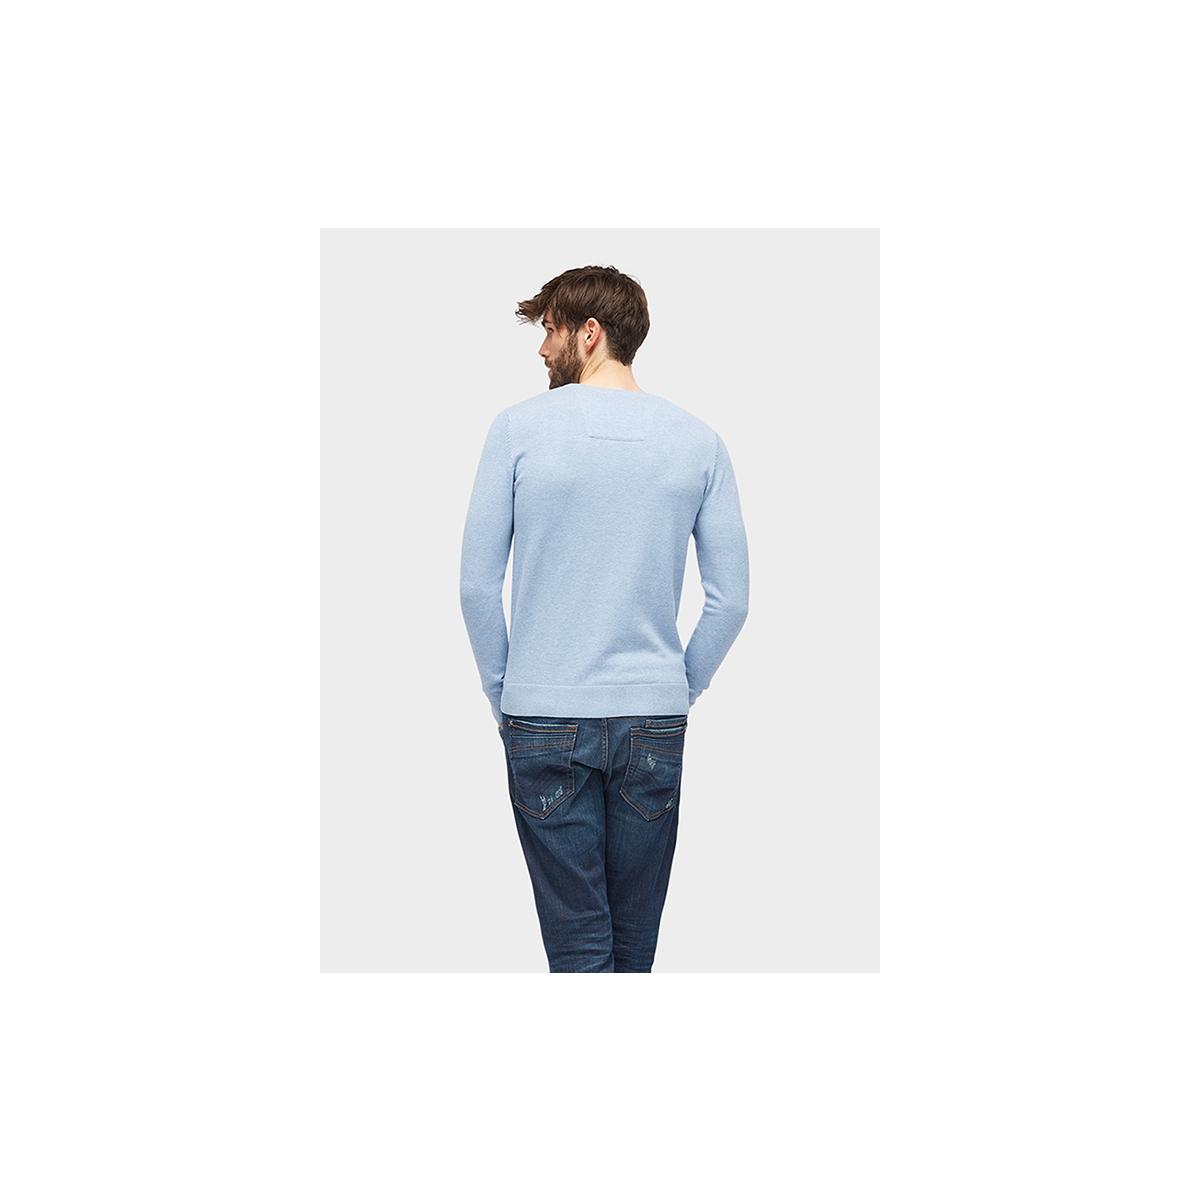 3022880.09.10 tom tailor trui 6497